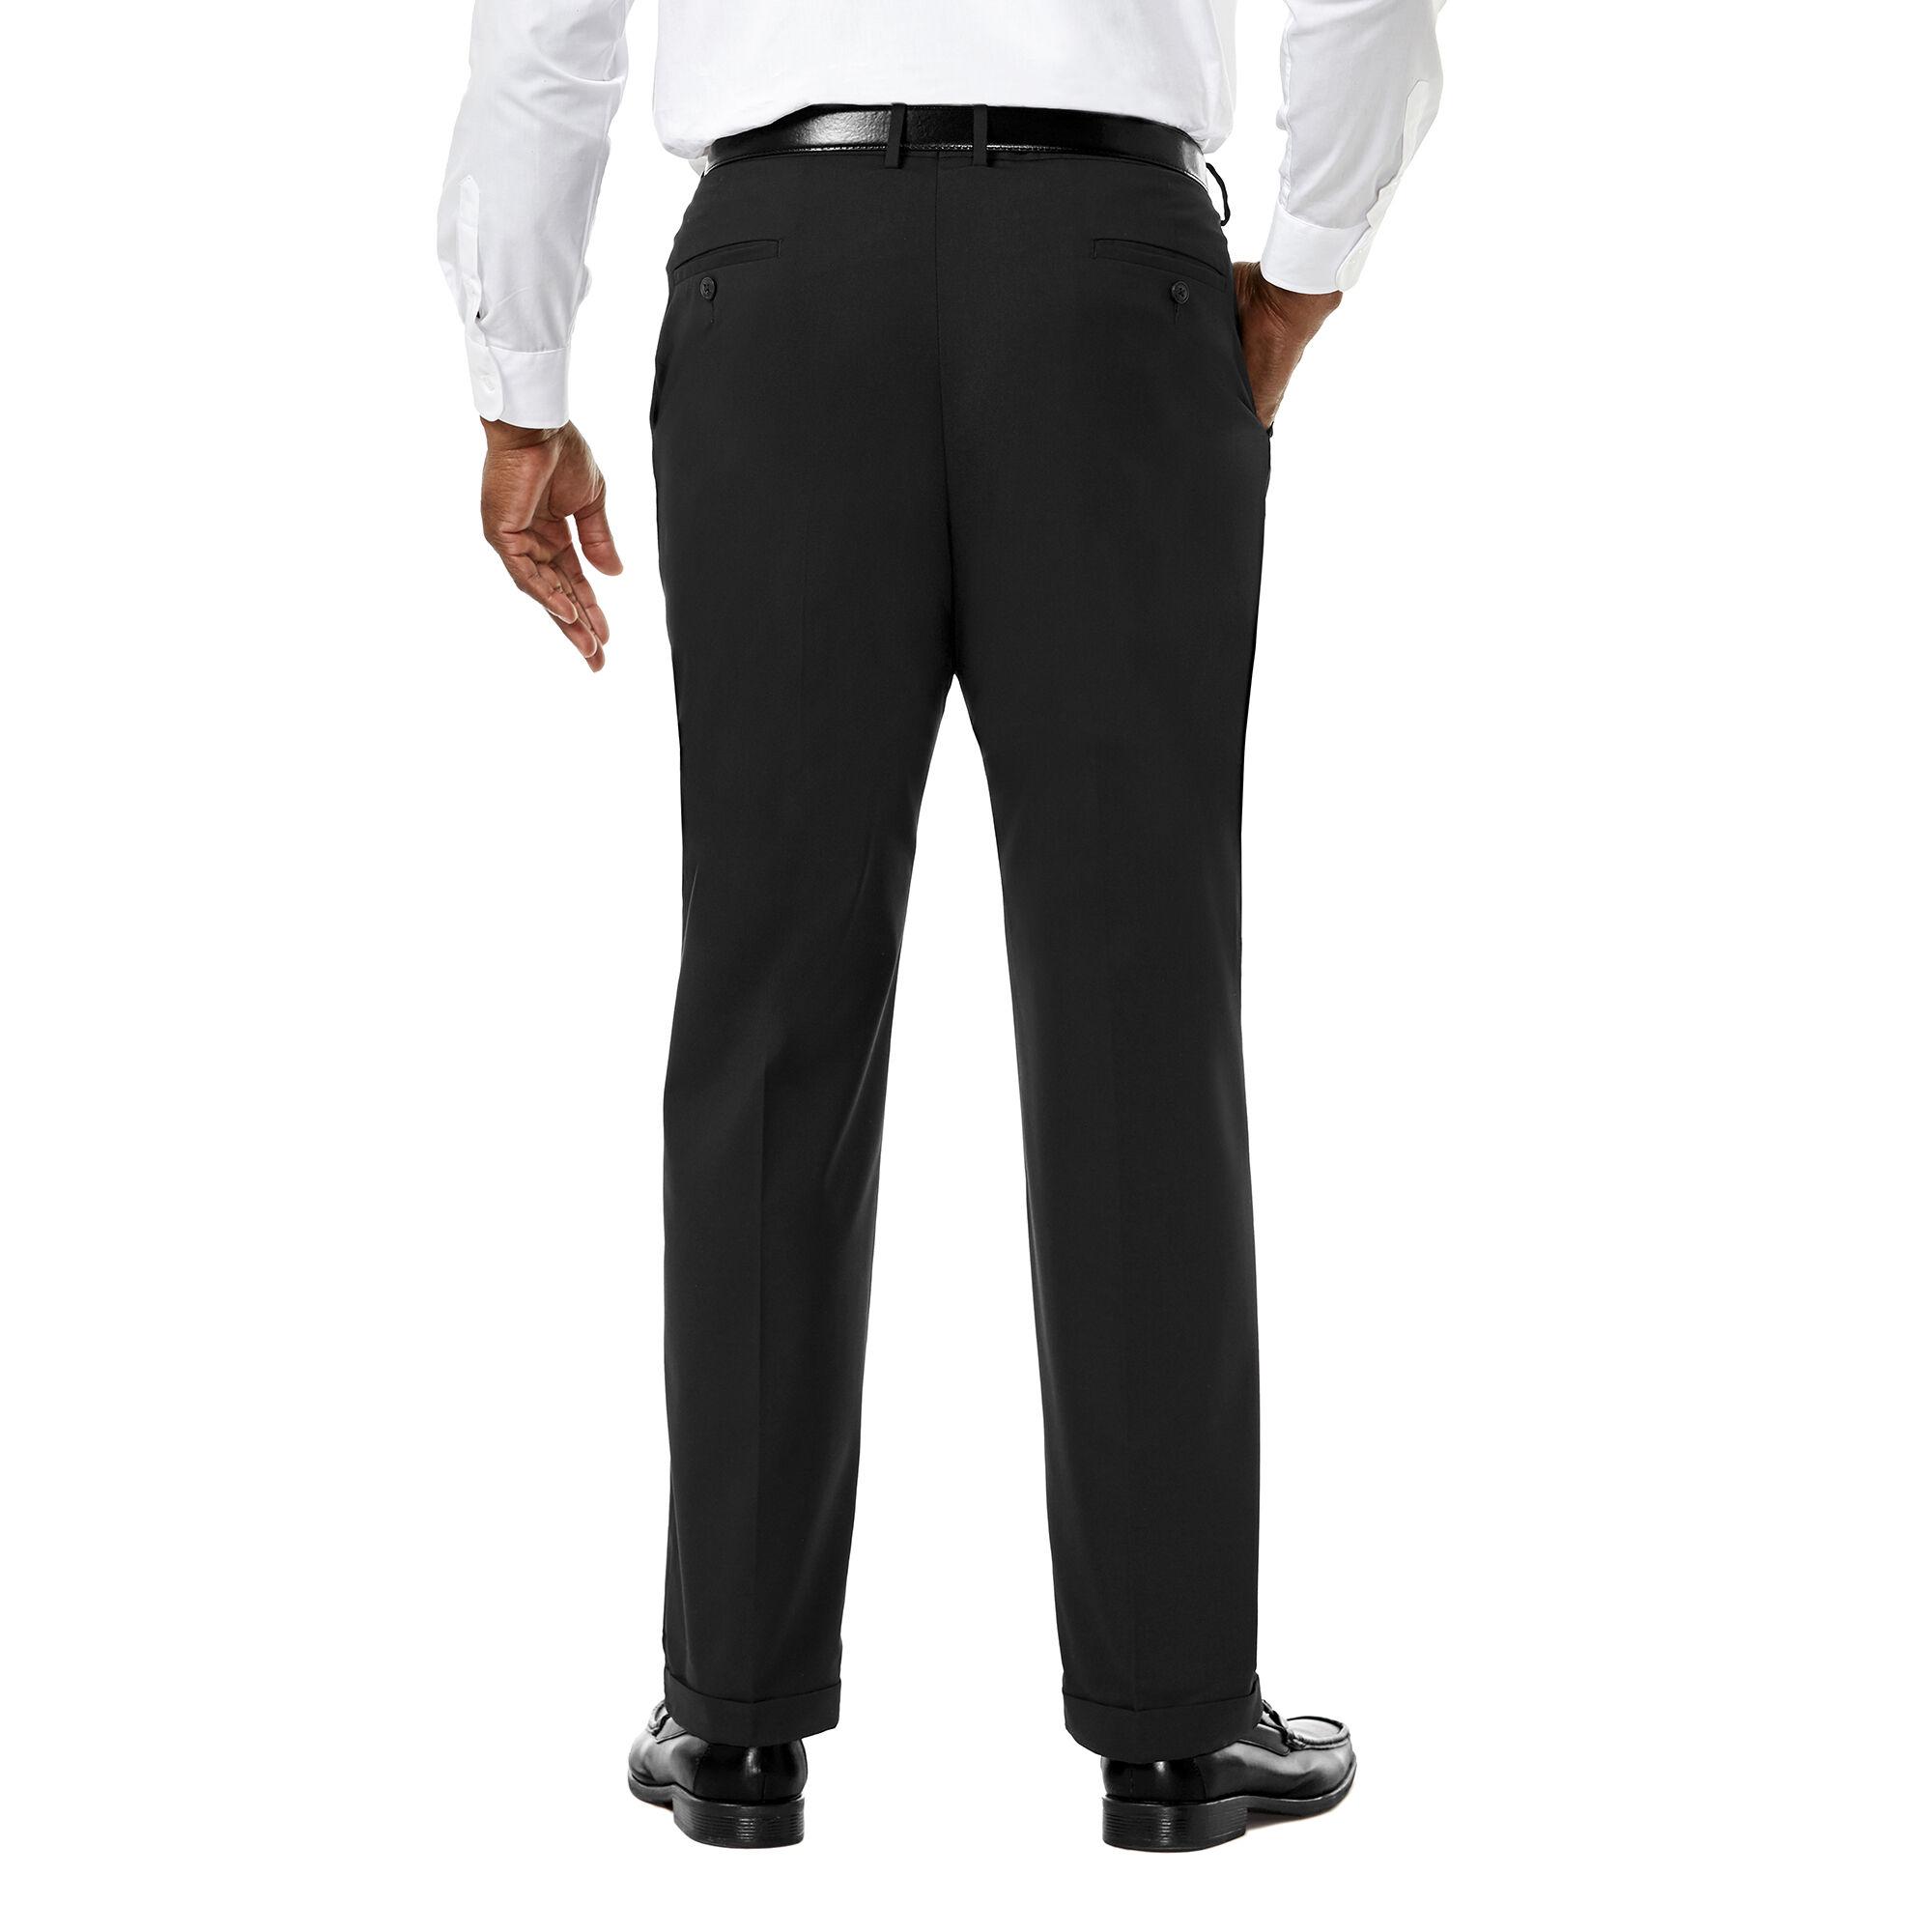 197e6ca3f92 Big  amp  Tall Premium Stretch Dress Pant ...